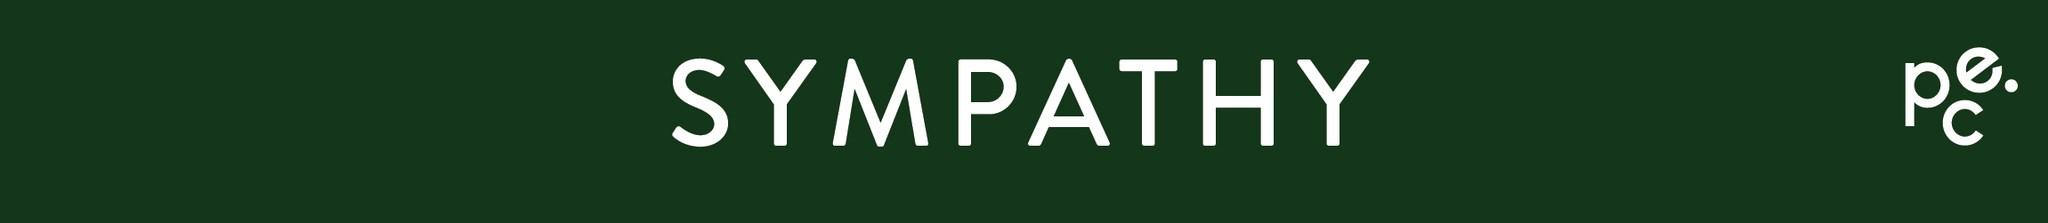 Strip - Sympathy|Paper E. Clips